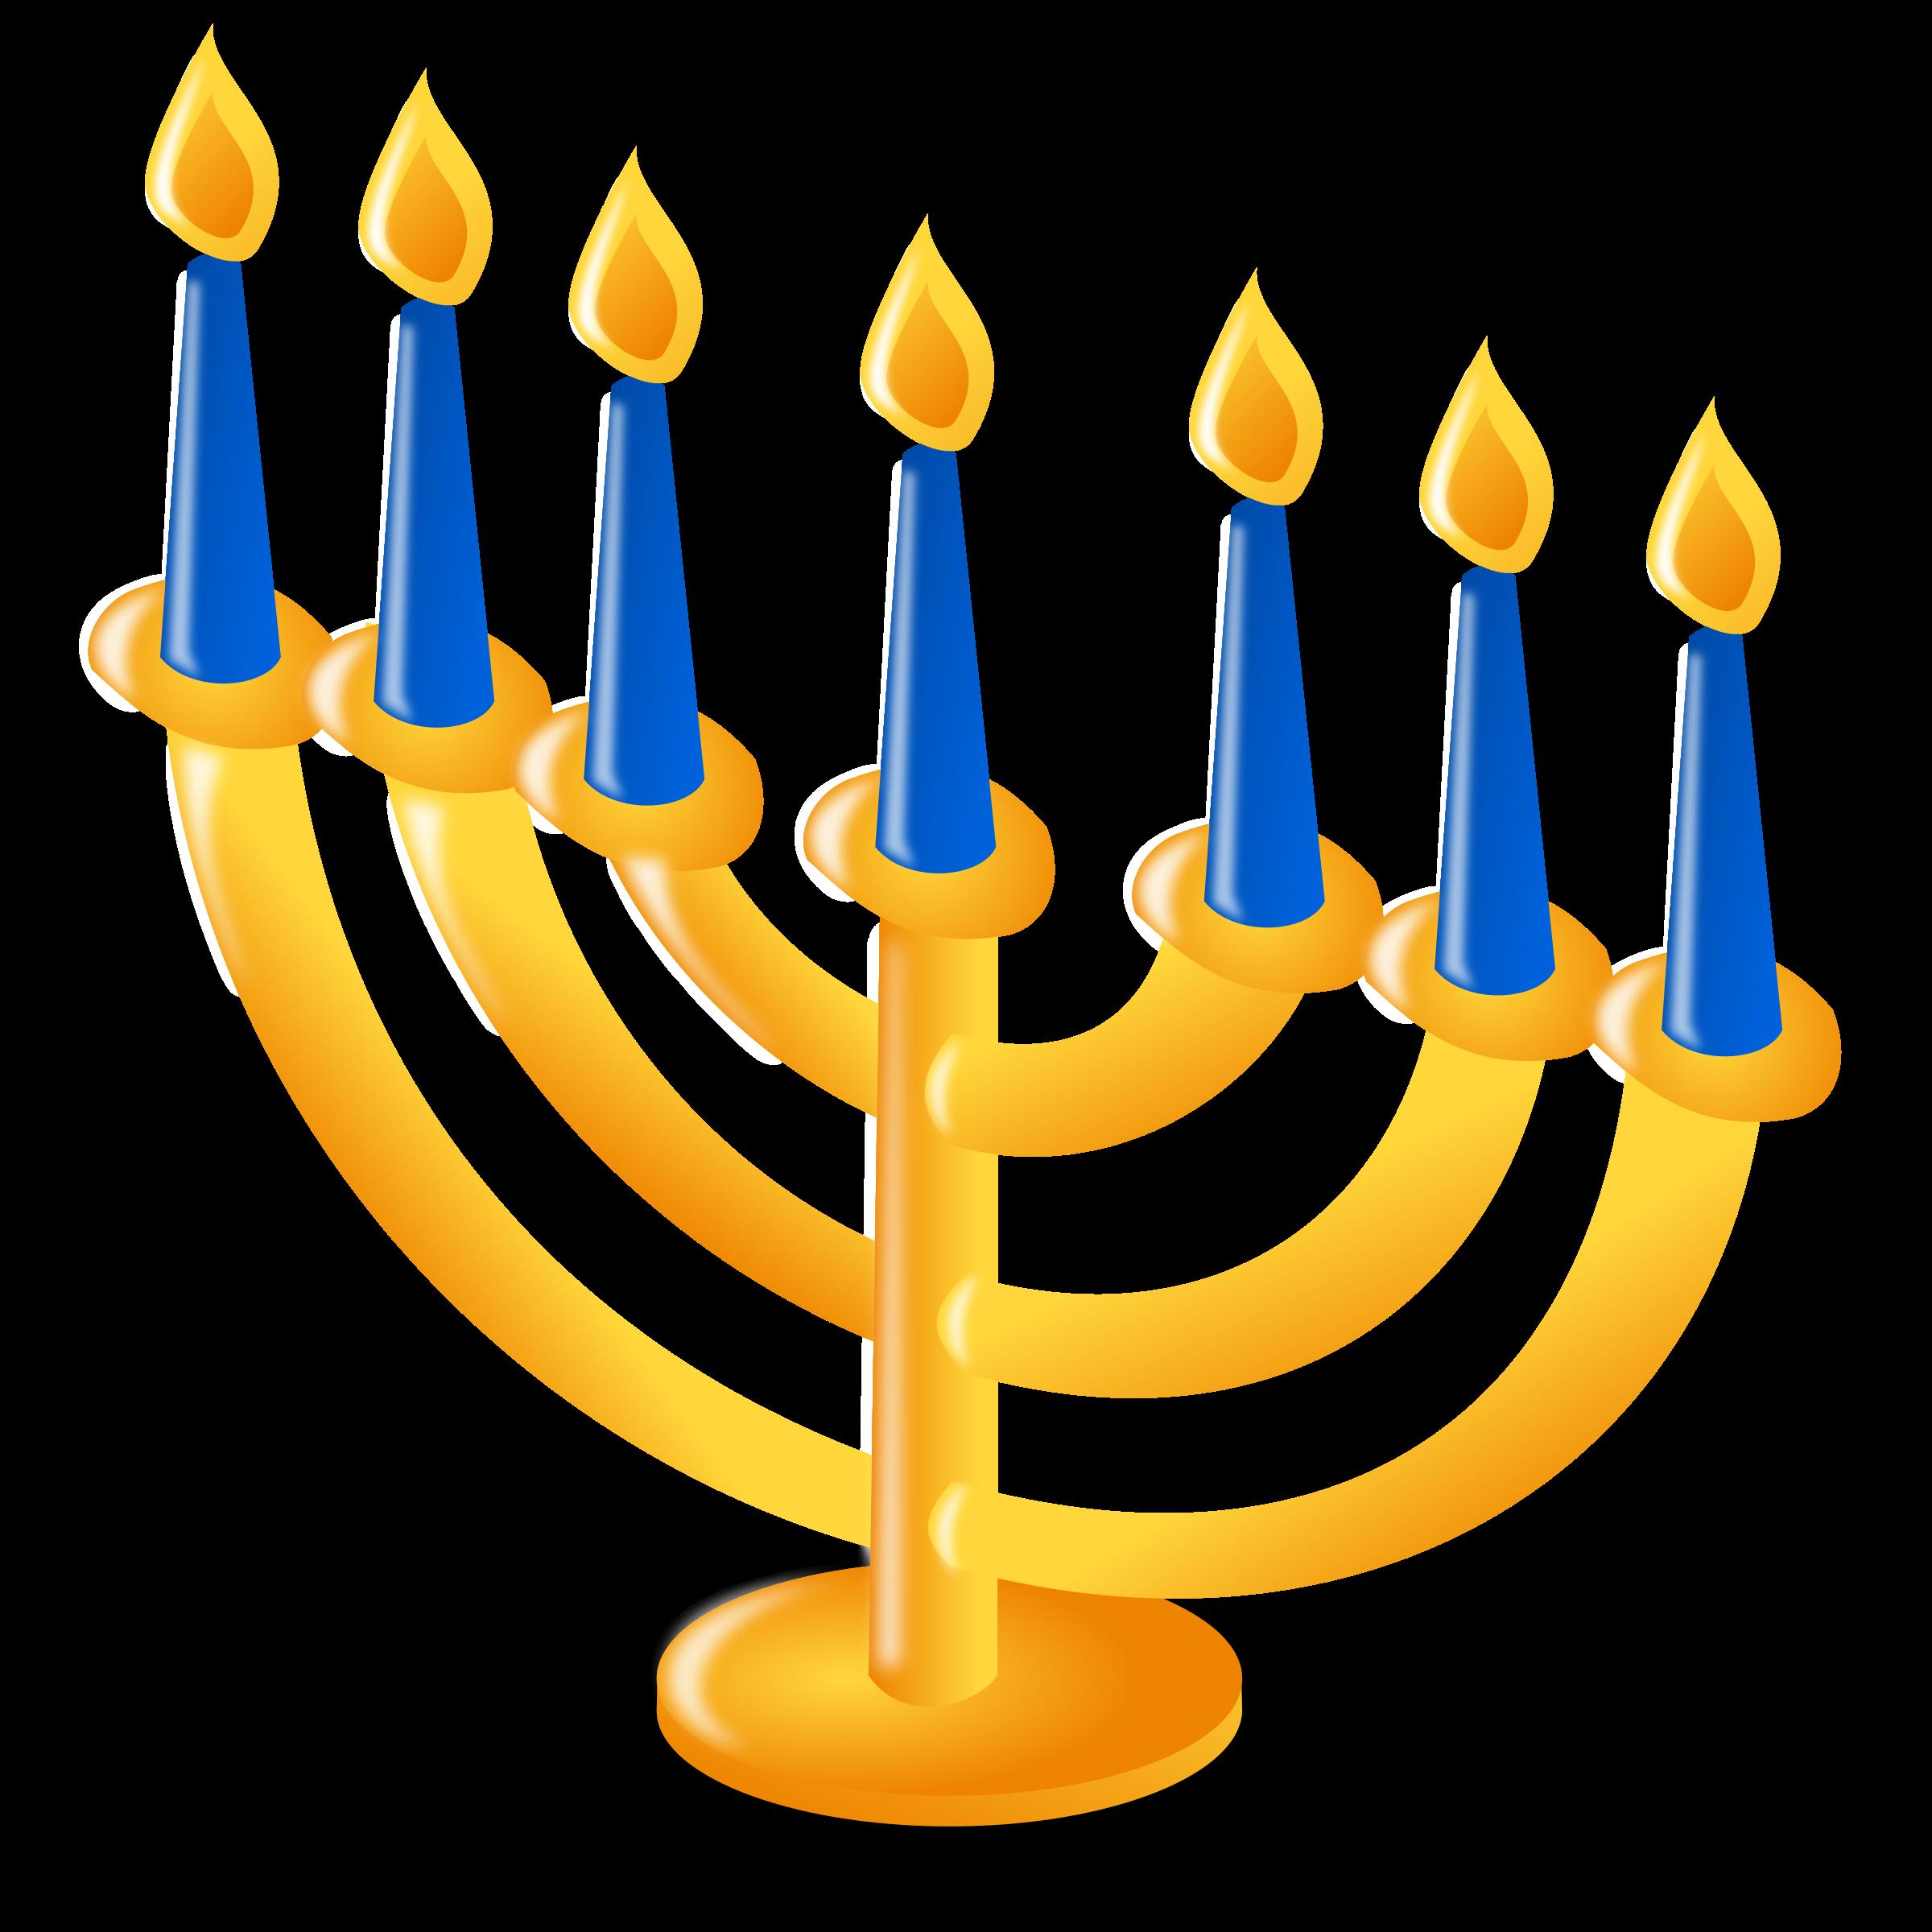 Clipart winter holiday. Hanukkah icon